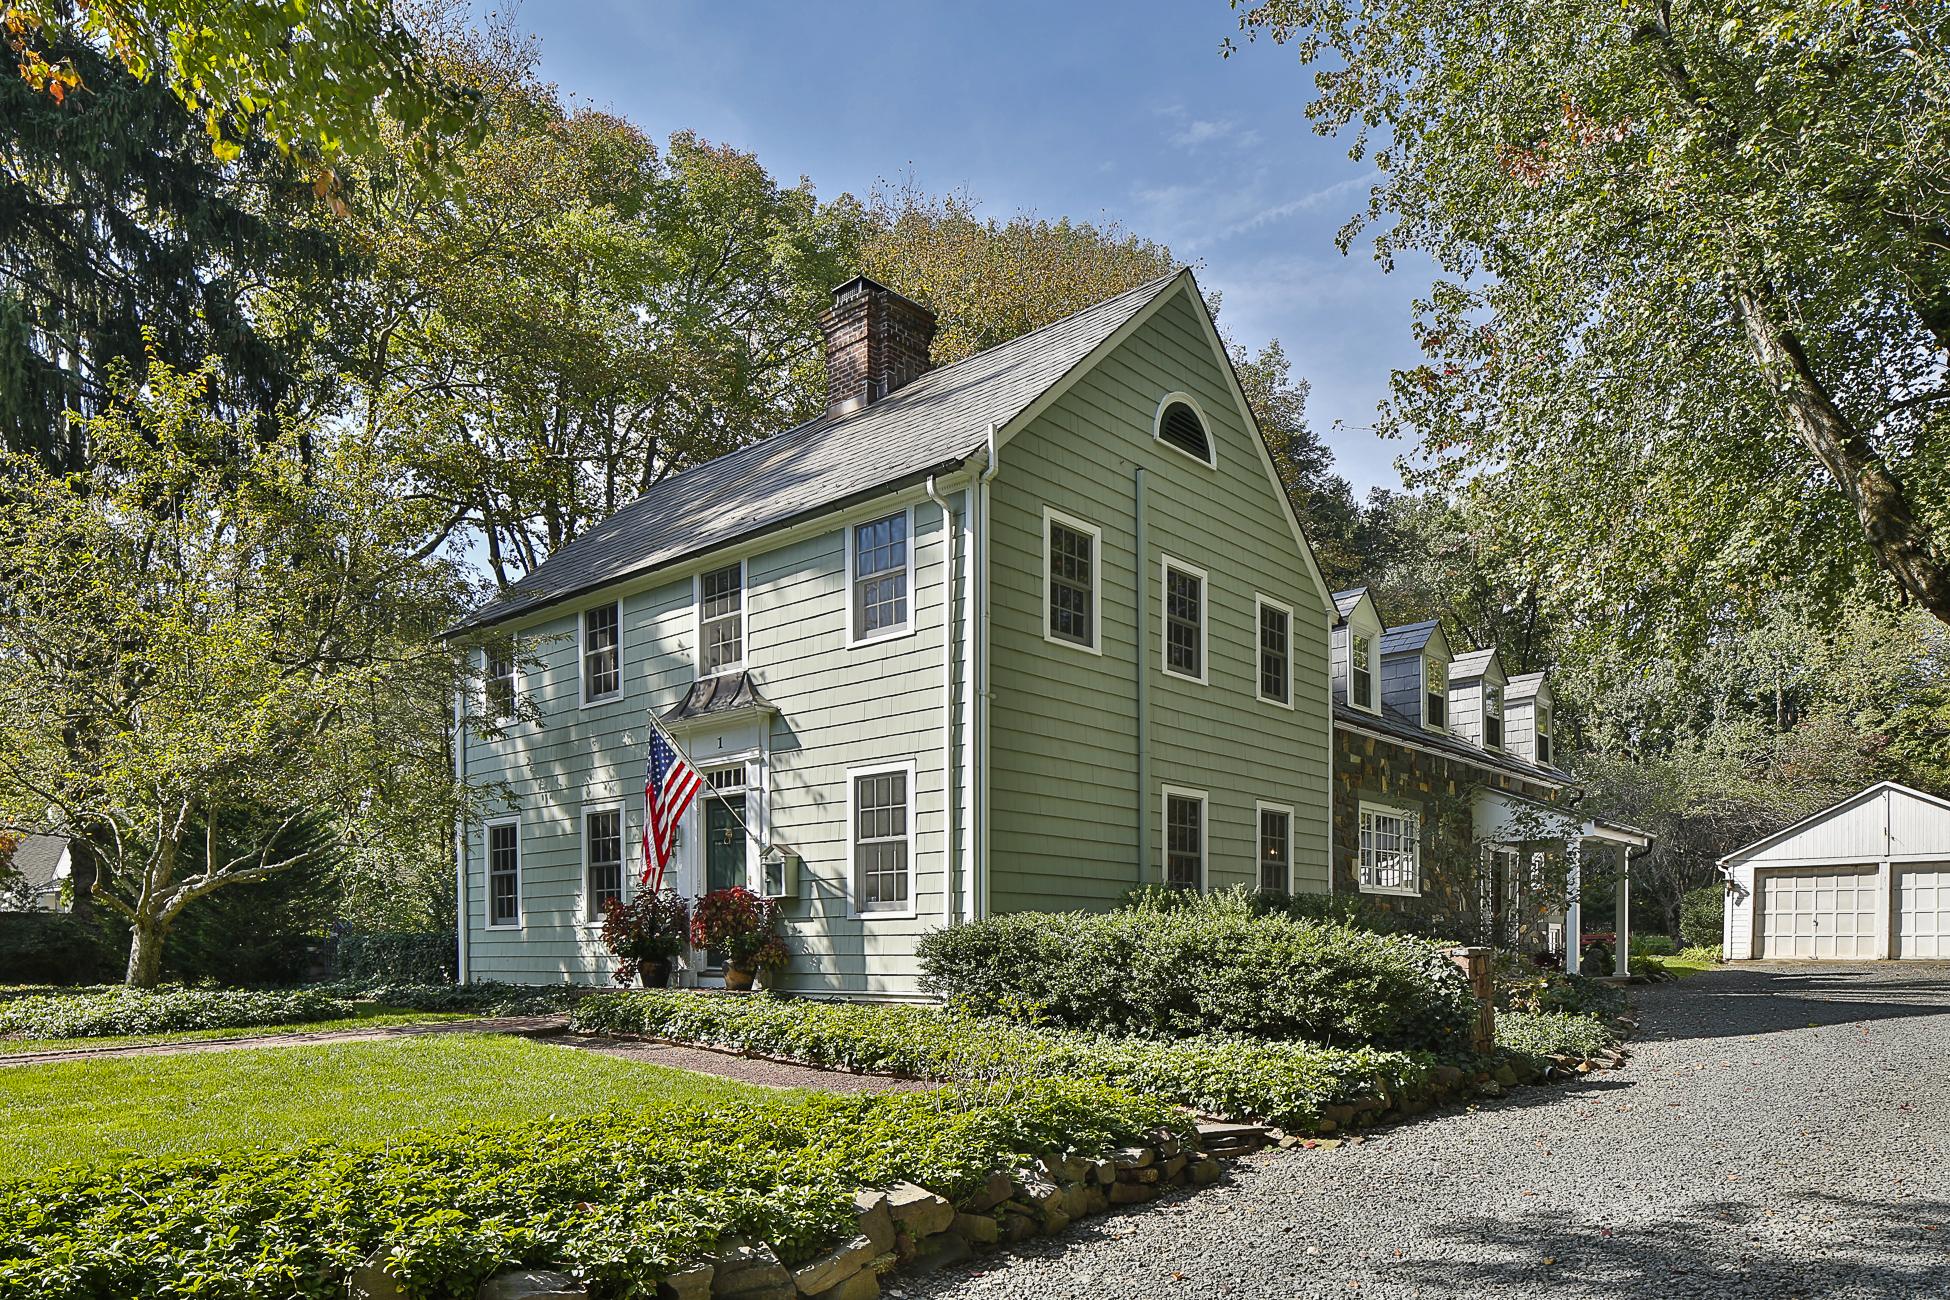 独户住宅 为 销售 在 Designed by a Master as his own Private Residence 1 Ober Road Princeton, 新泽西州 08540 美国